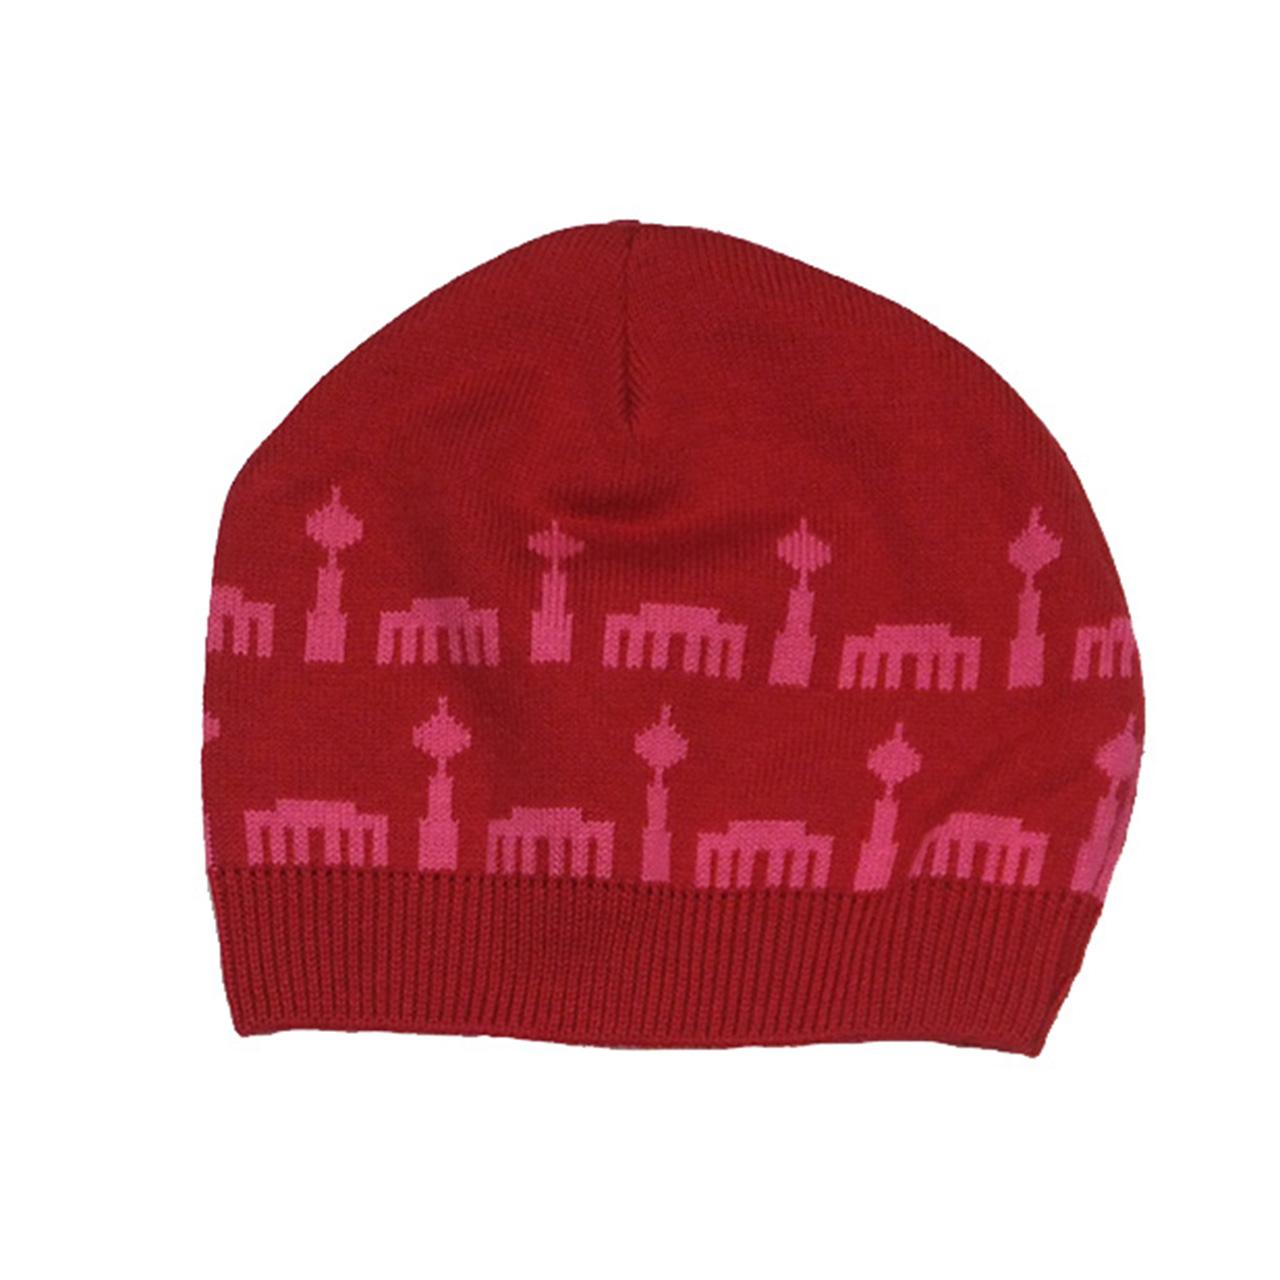 Kindermütze Berliner Design rot/pink